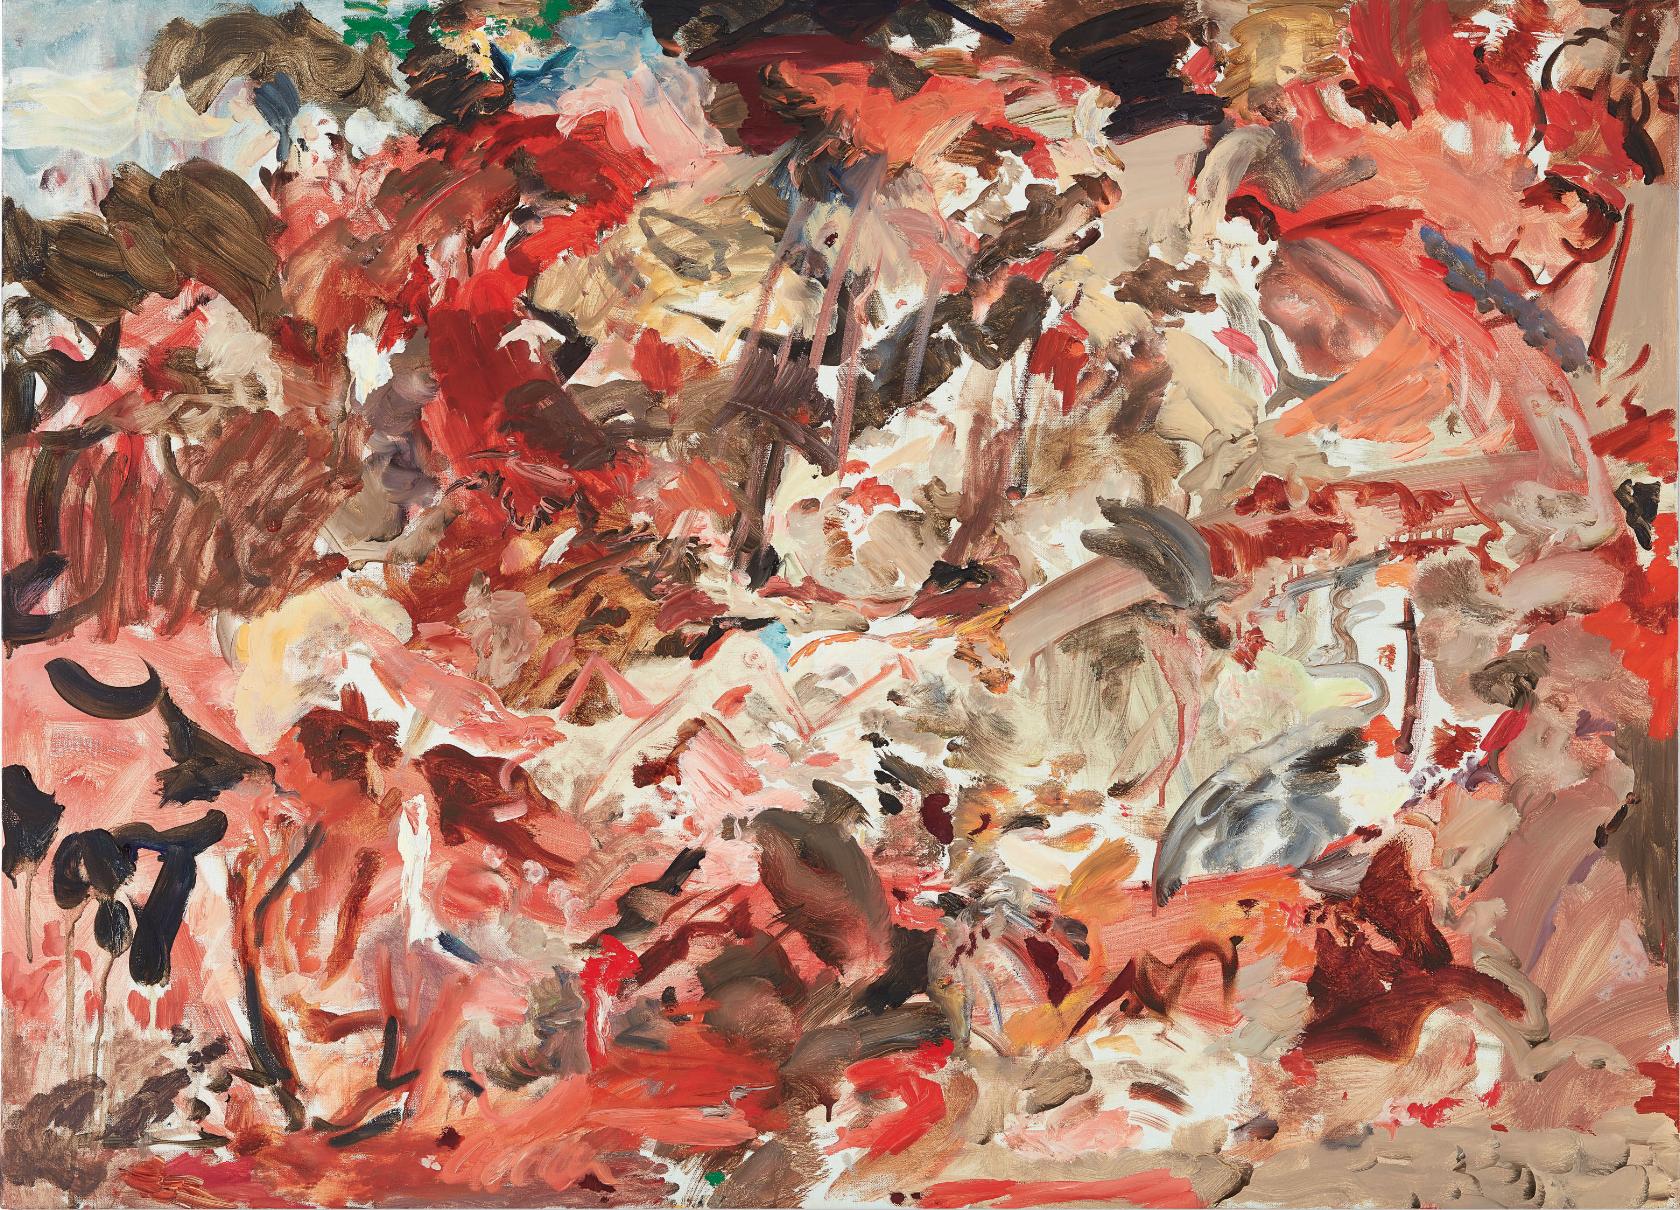 Cecily Brown, Yet to be titled, 2008. Verkauft für 791.000 GBP | Foto: Christie's